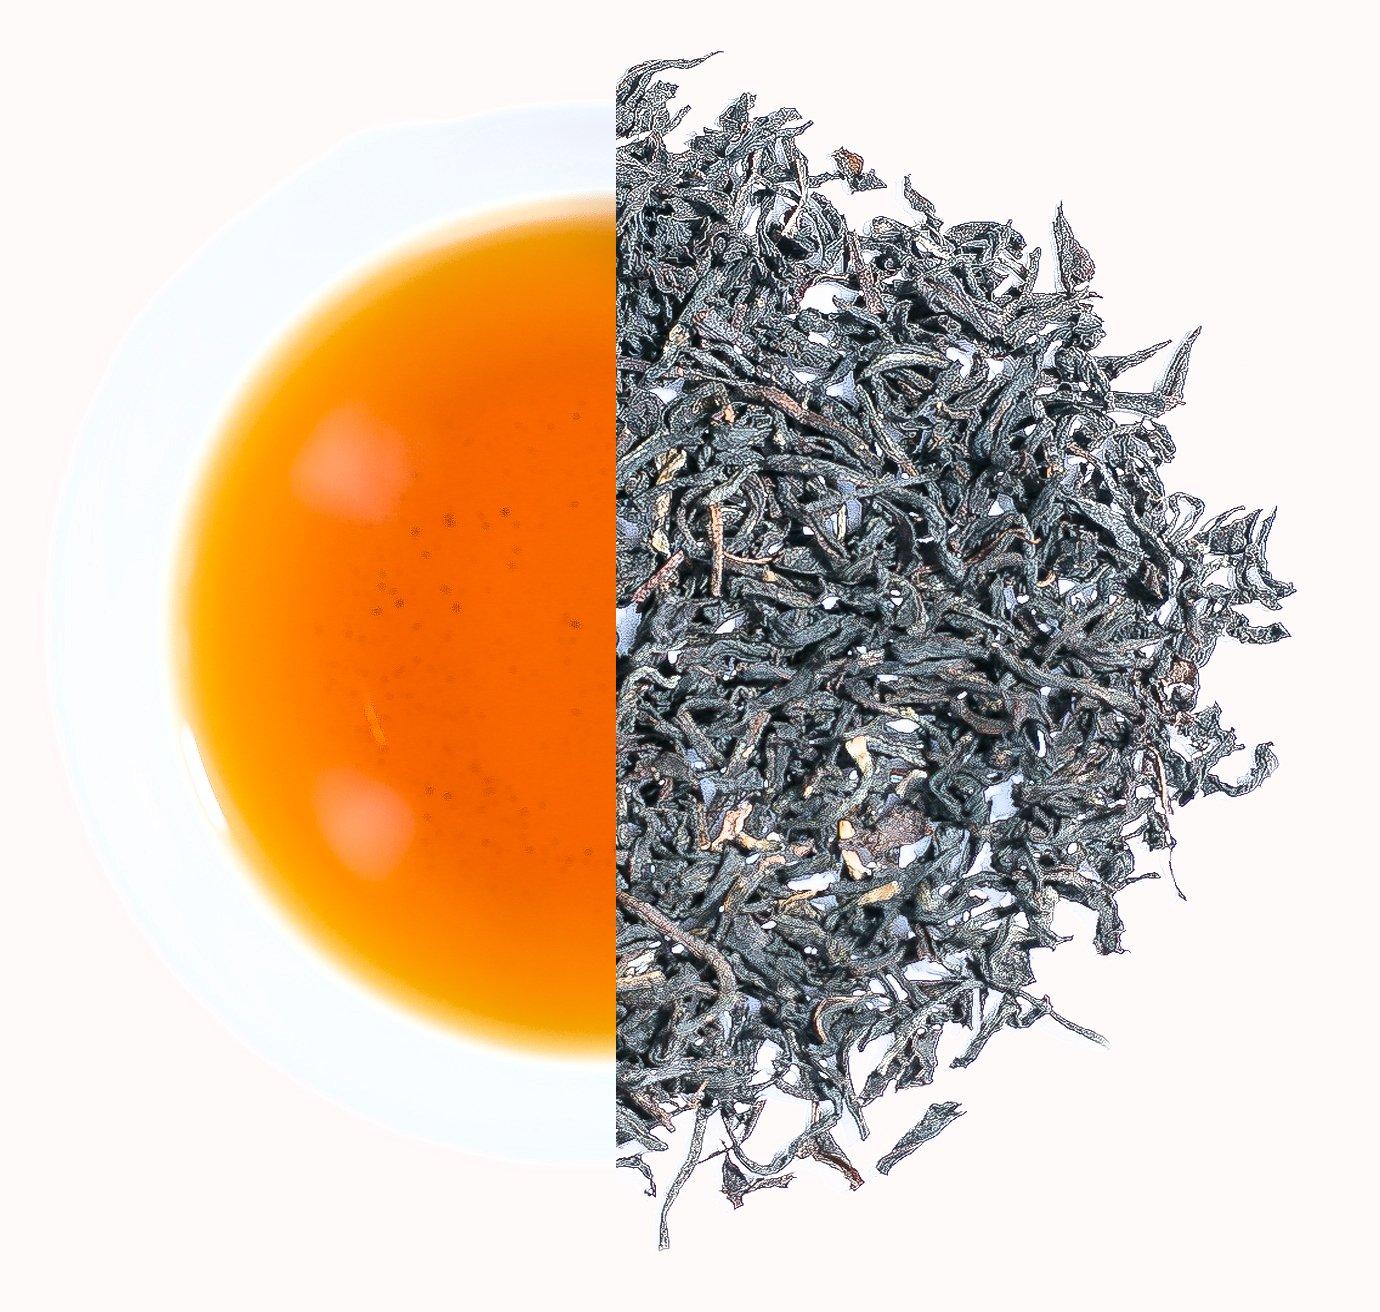 Bulk Organic Assam Black Tea from Chota Tingrai Tea Estate, Loose Leaf, Grade TGFOP (22 lbs.)